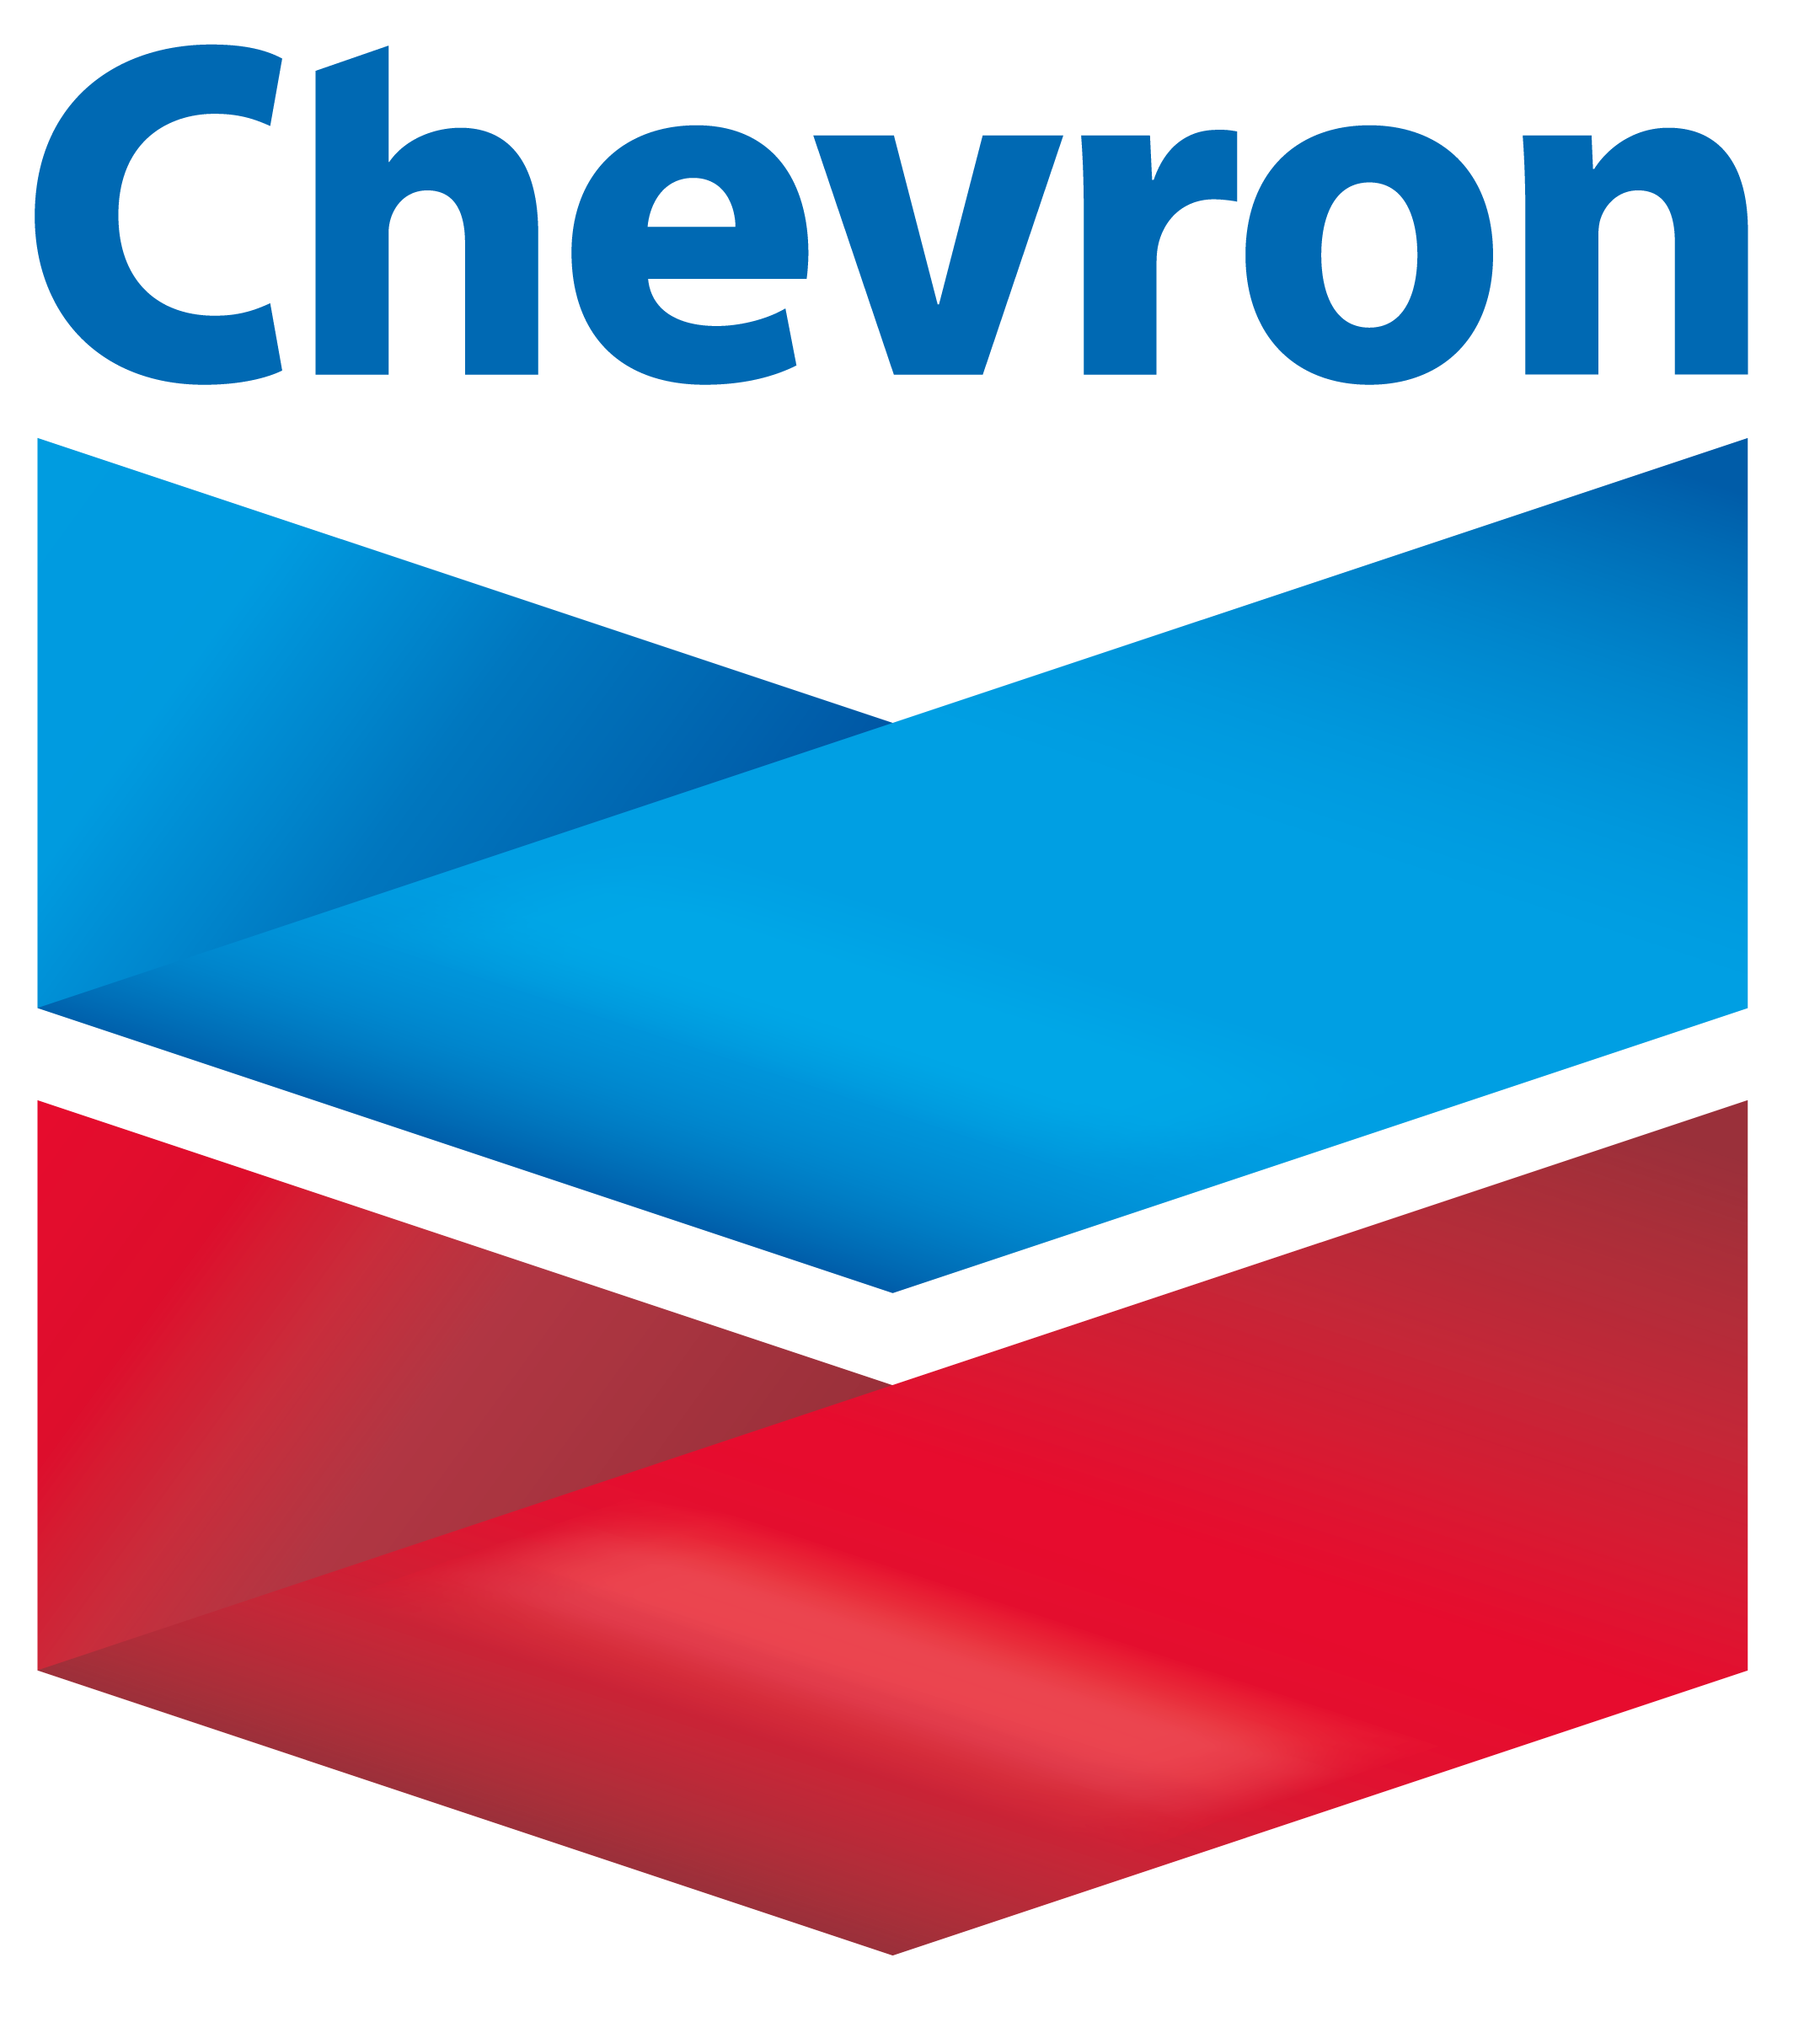 chevron logo 1 - Chevron Logo